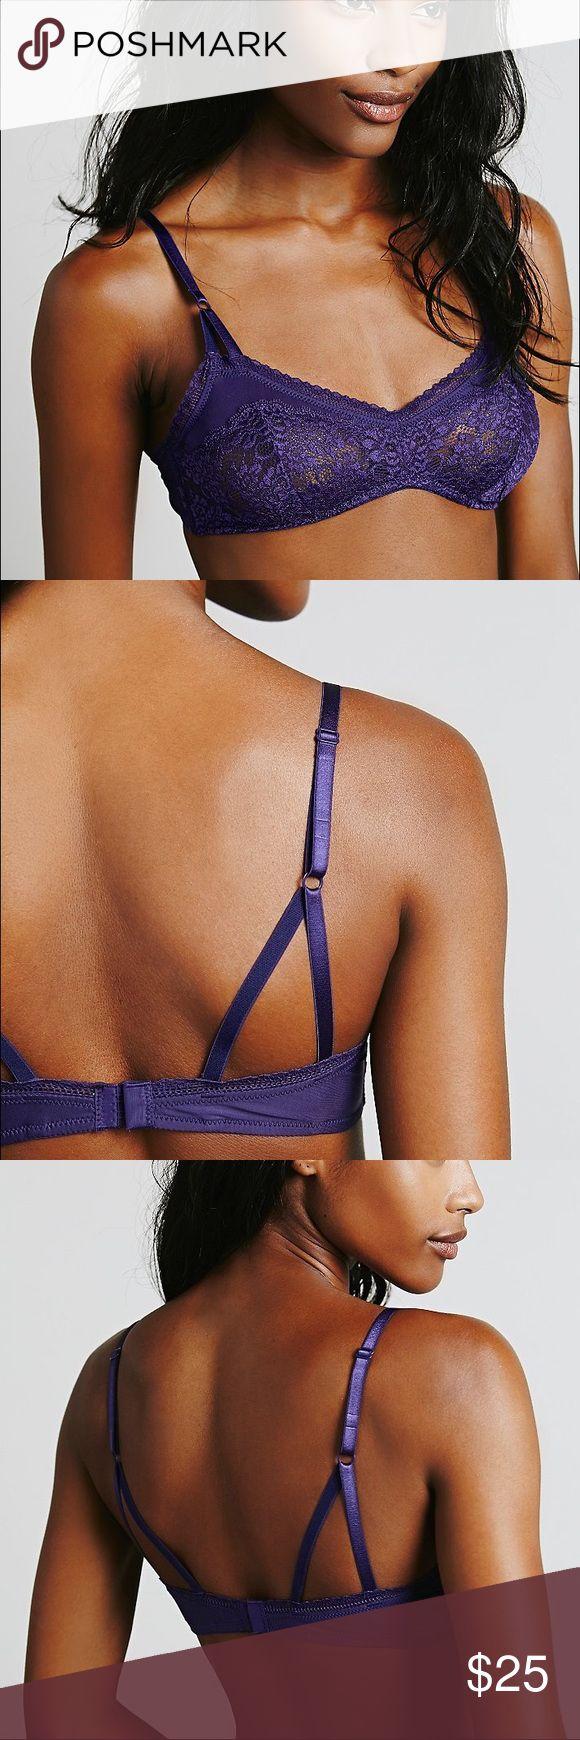 Free People purple lace mystic garden bra Purple lace bra. Free People Other